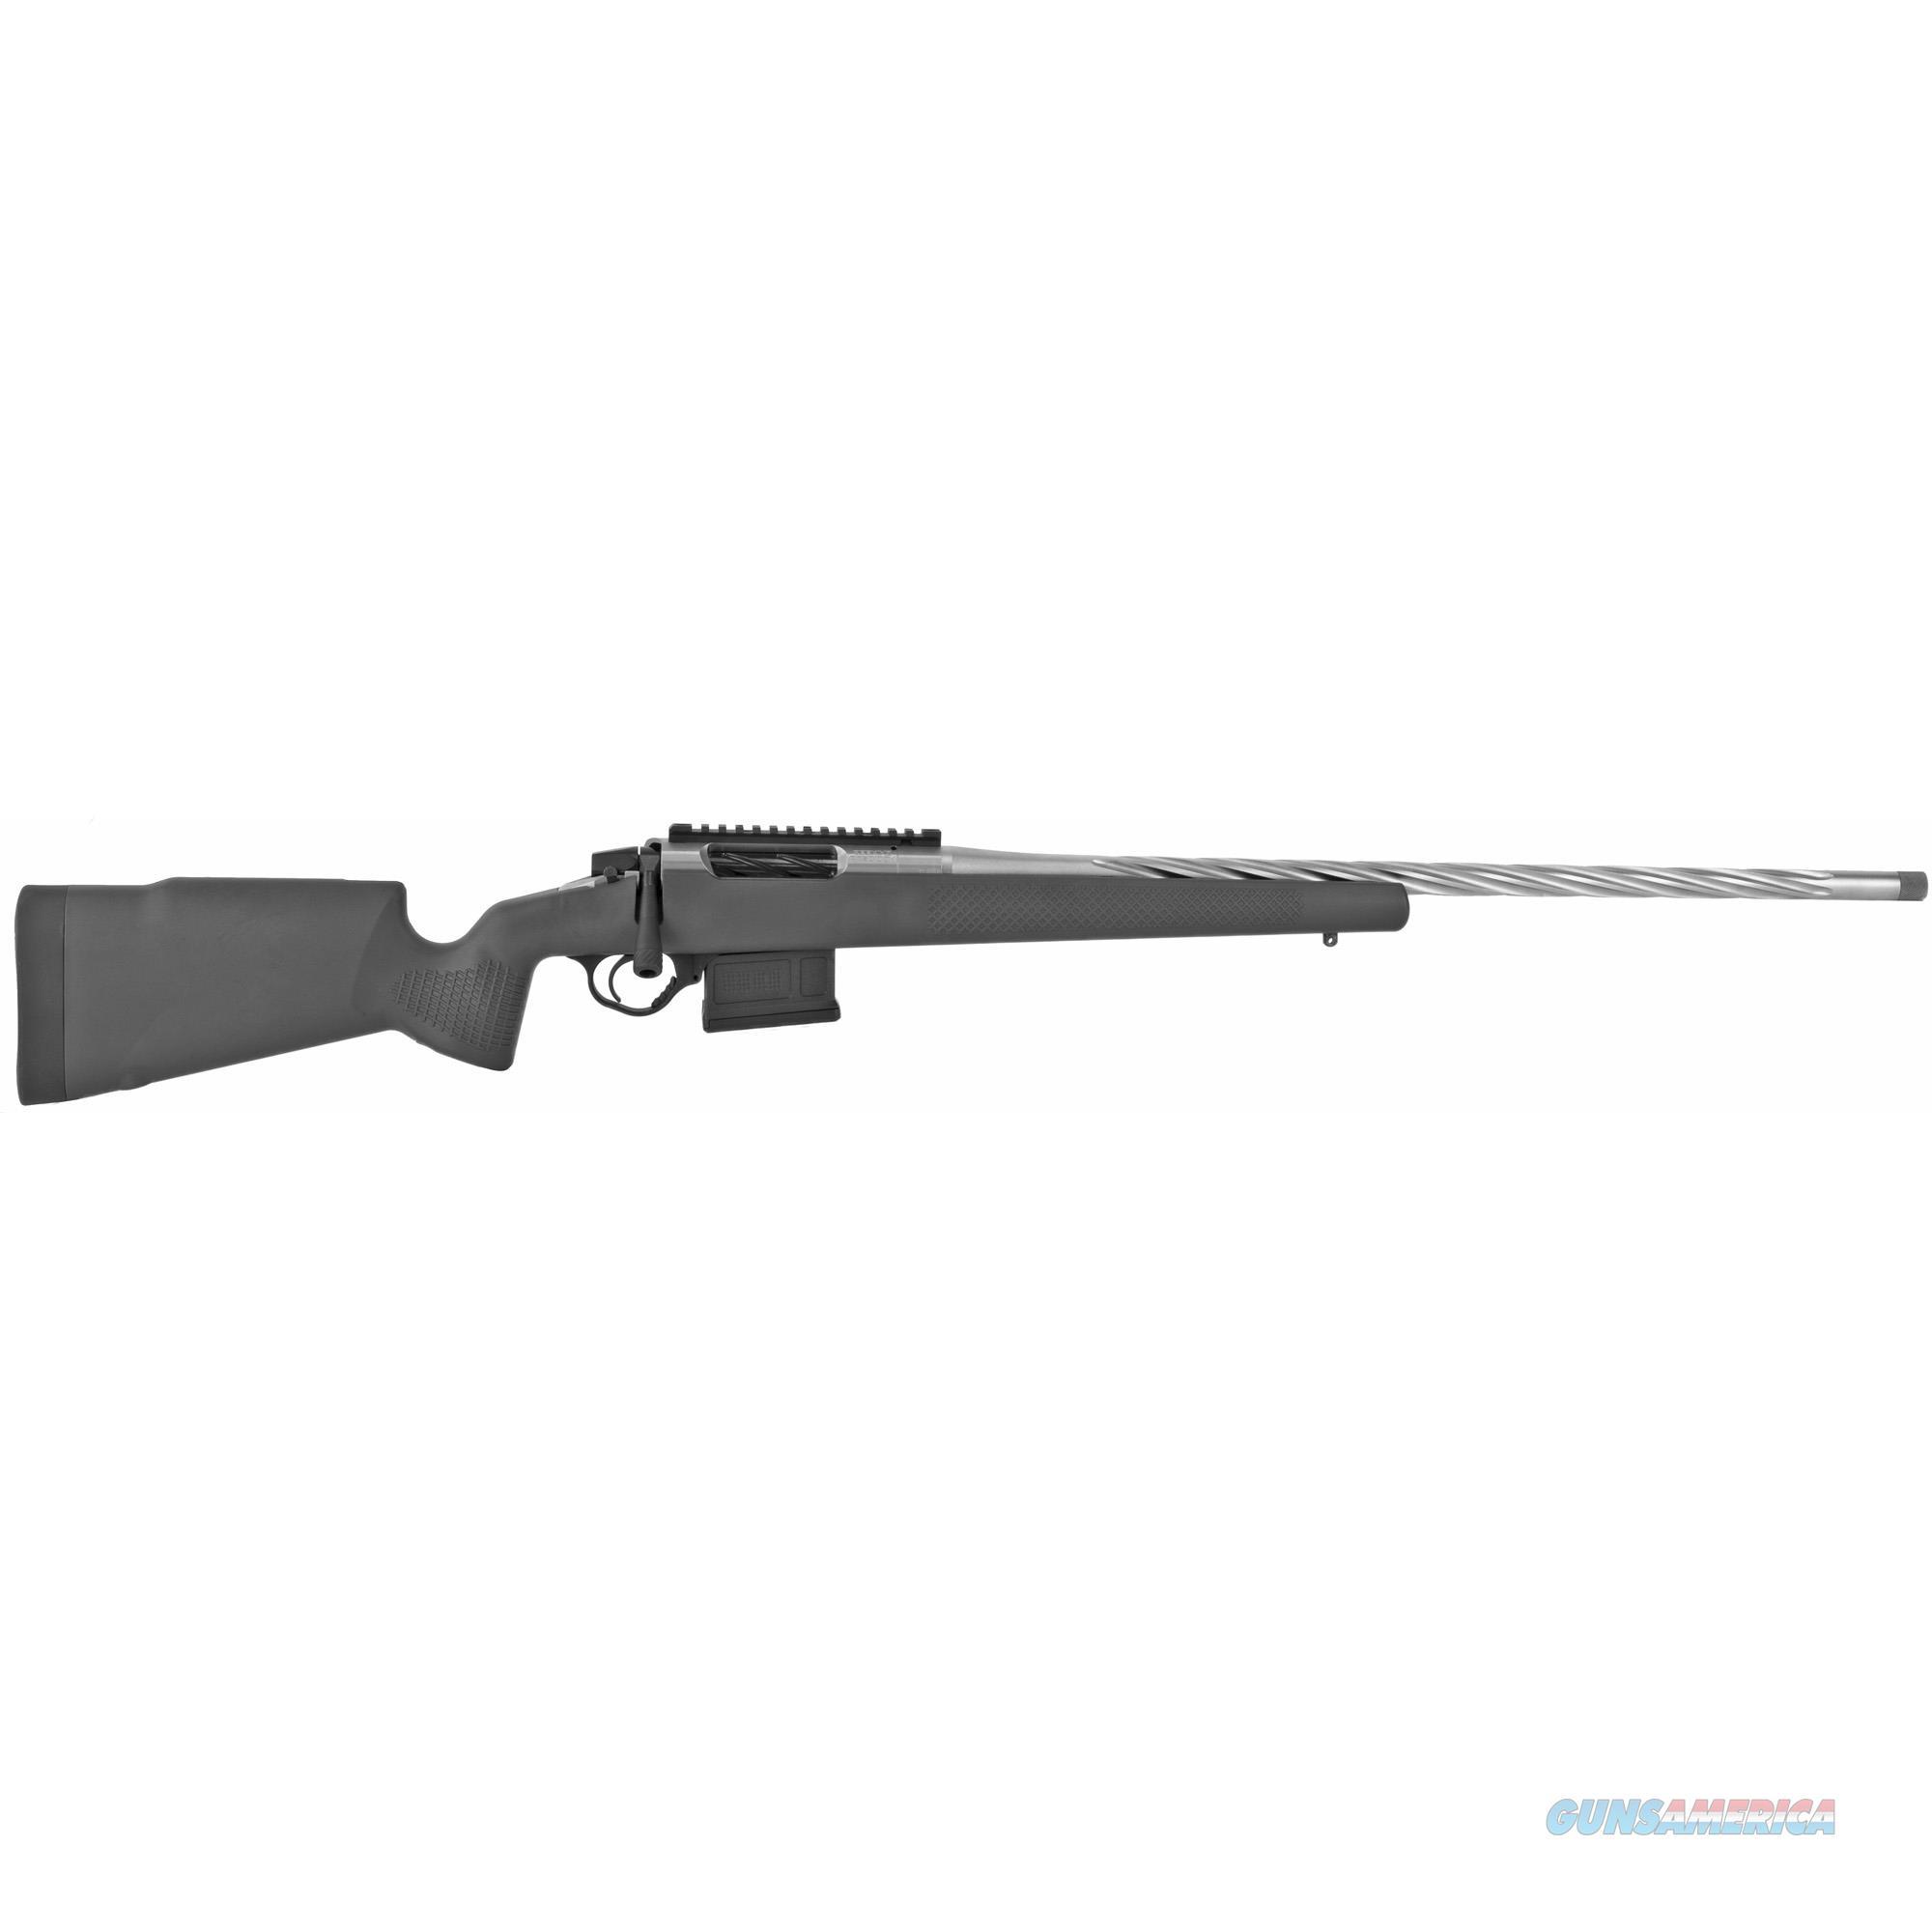 "Seekins Precision Pro Hunter 2 6mm Creedmoor 24"" Carbon Fiber 5 Rd Mag   Guns > Rifles > S Misc Rifles"